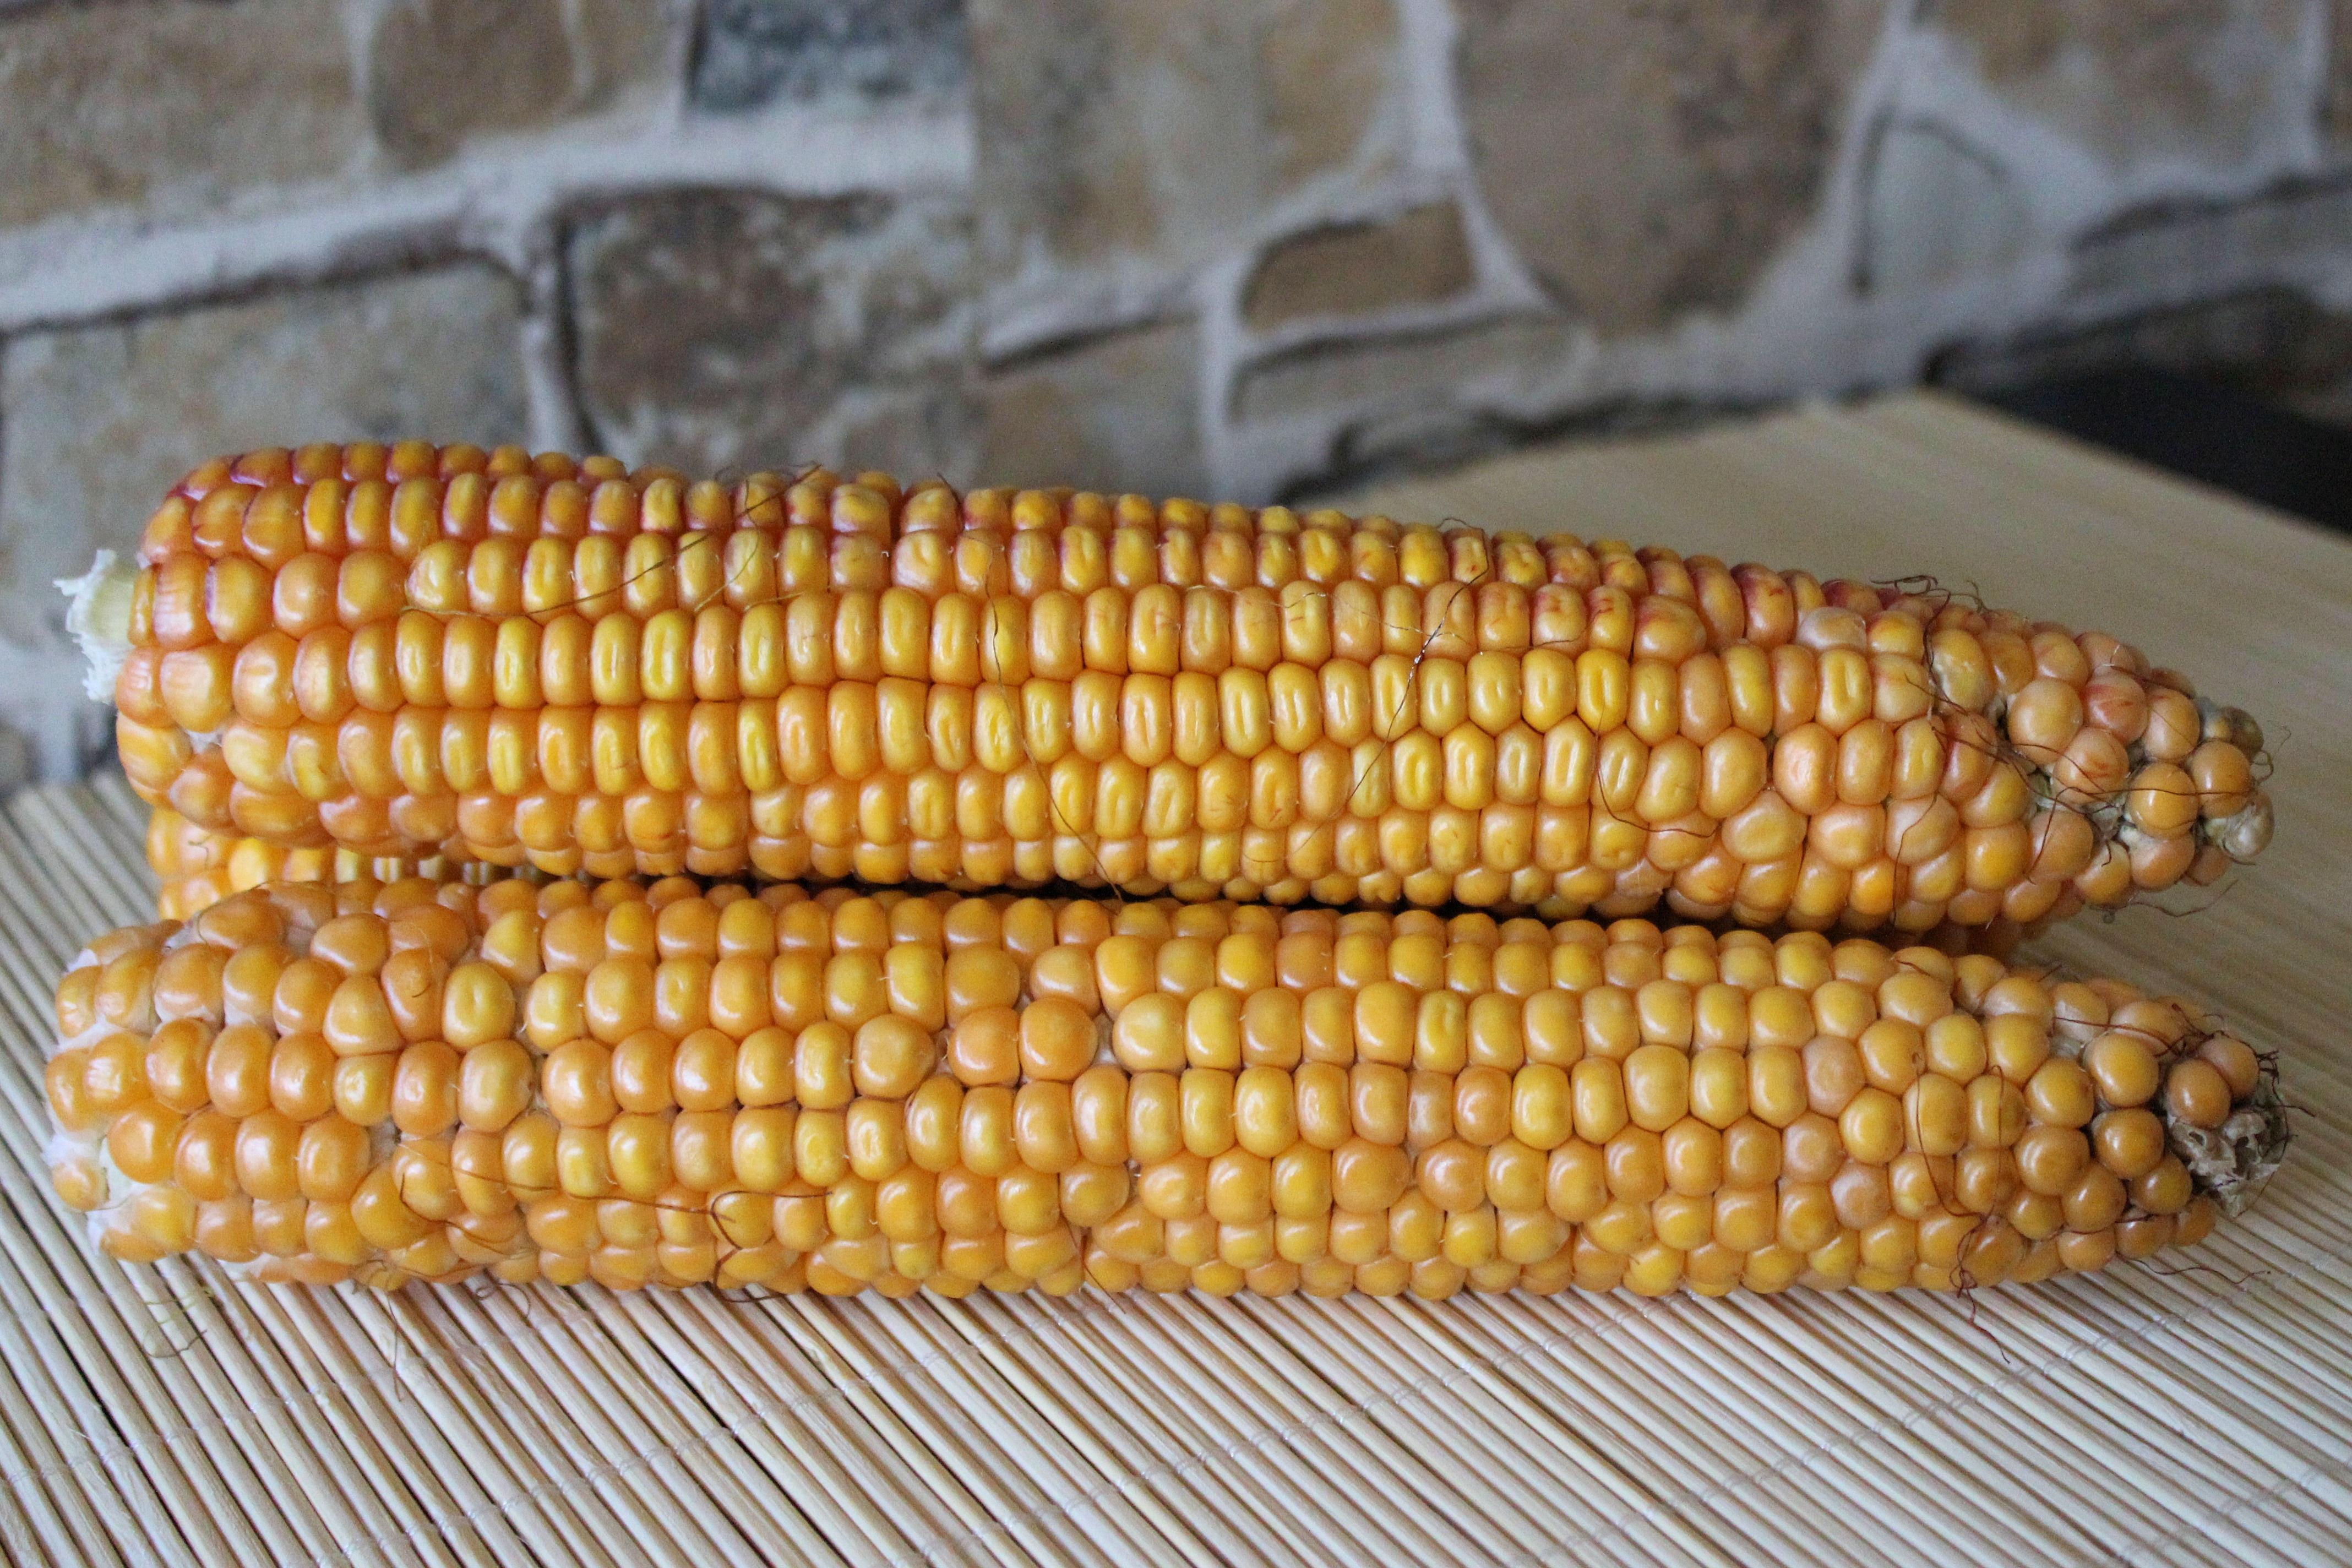 Free Images : produce, cuisine, vegetables, sweet corn